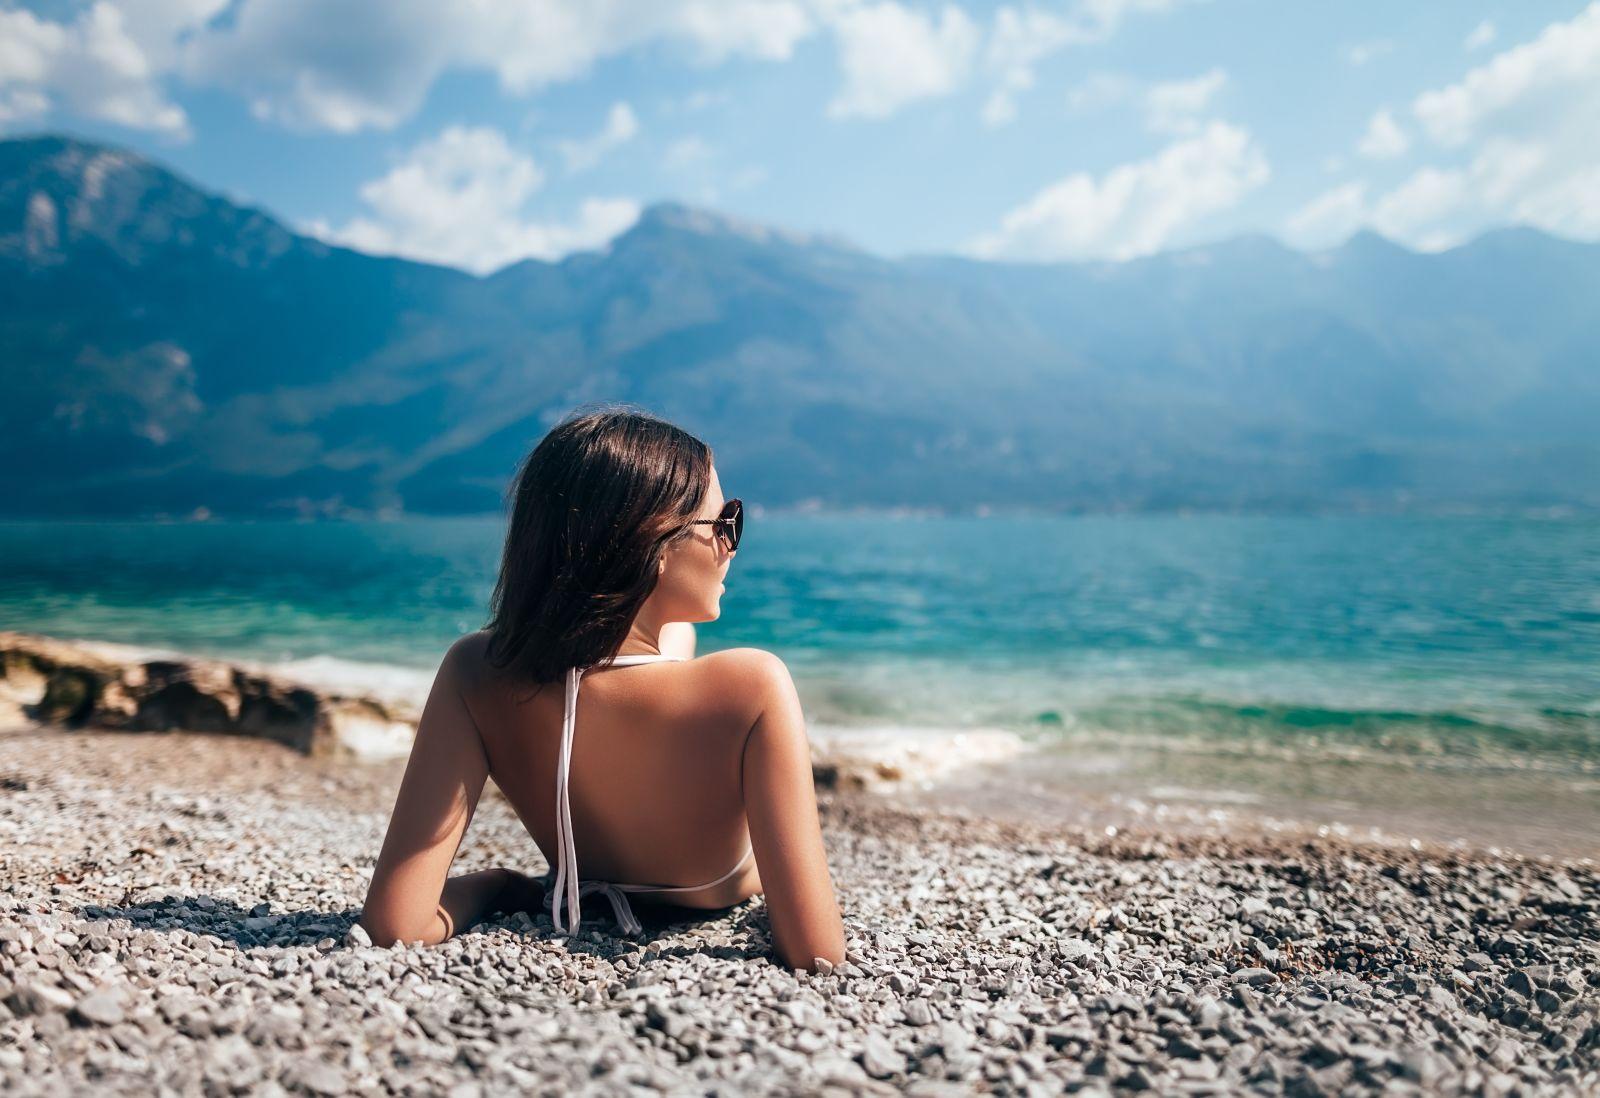 Frau am Sonnen am Gardasee, Italien